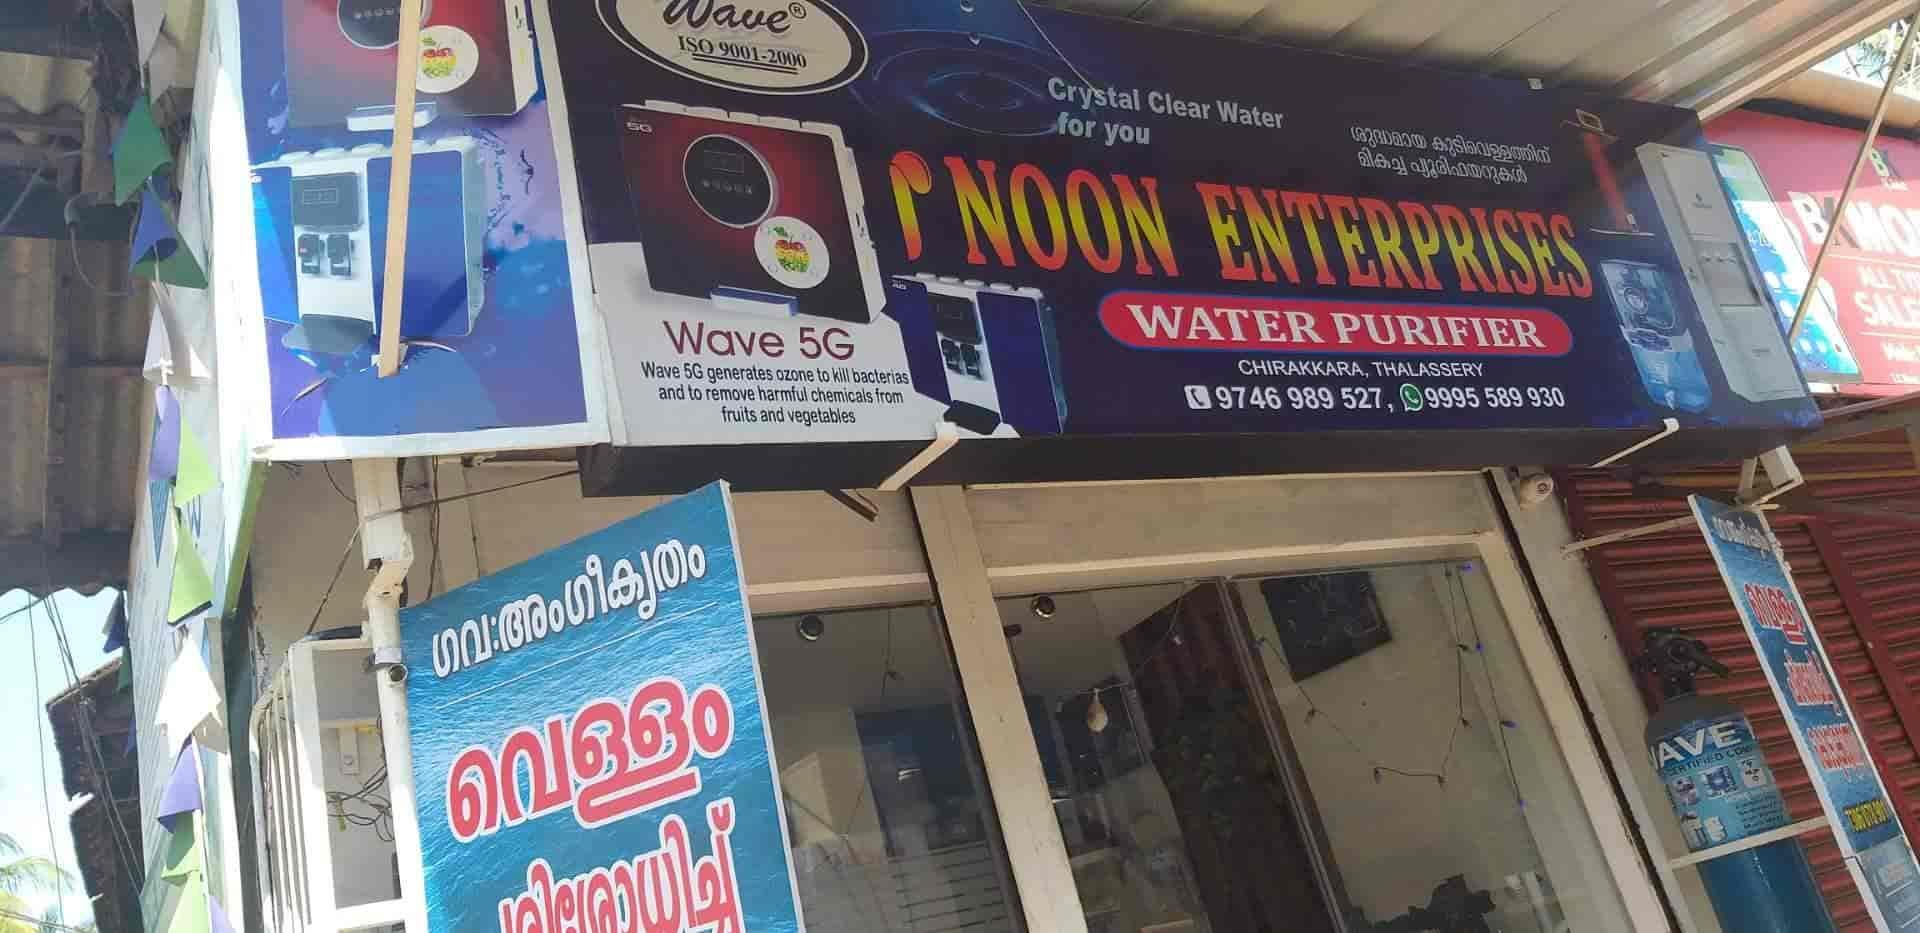 I Noon Enterprises Tc Road Ro Water Purifier Dealers Wave In Thalassery Thalassery Justdial